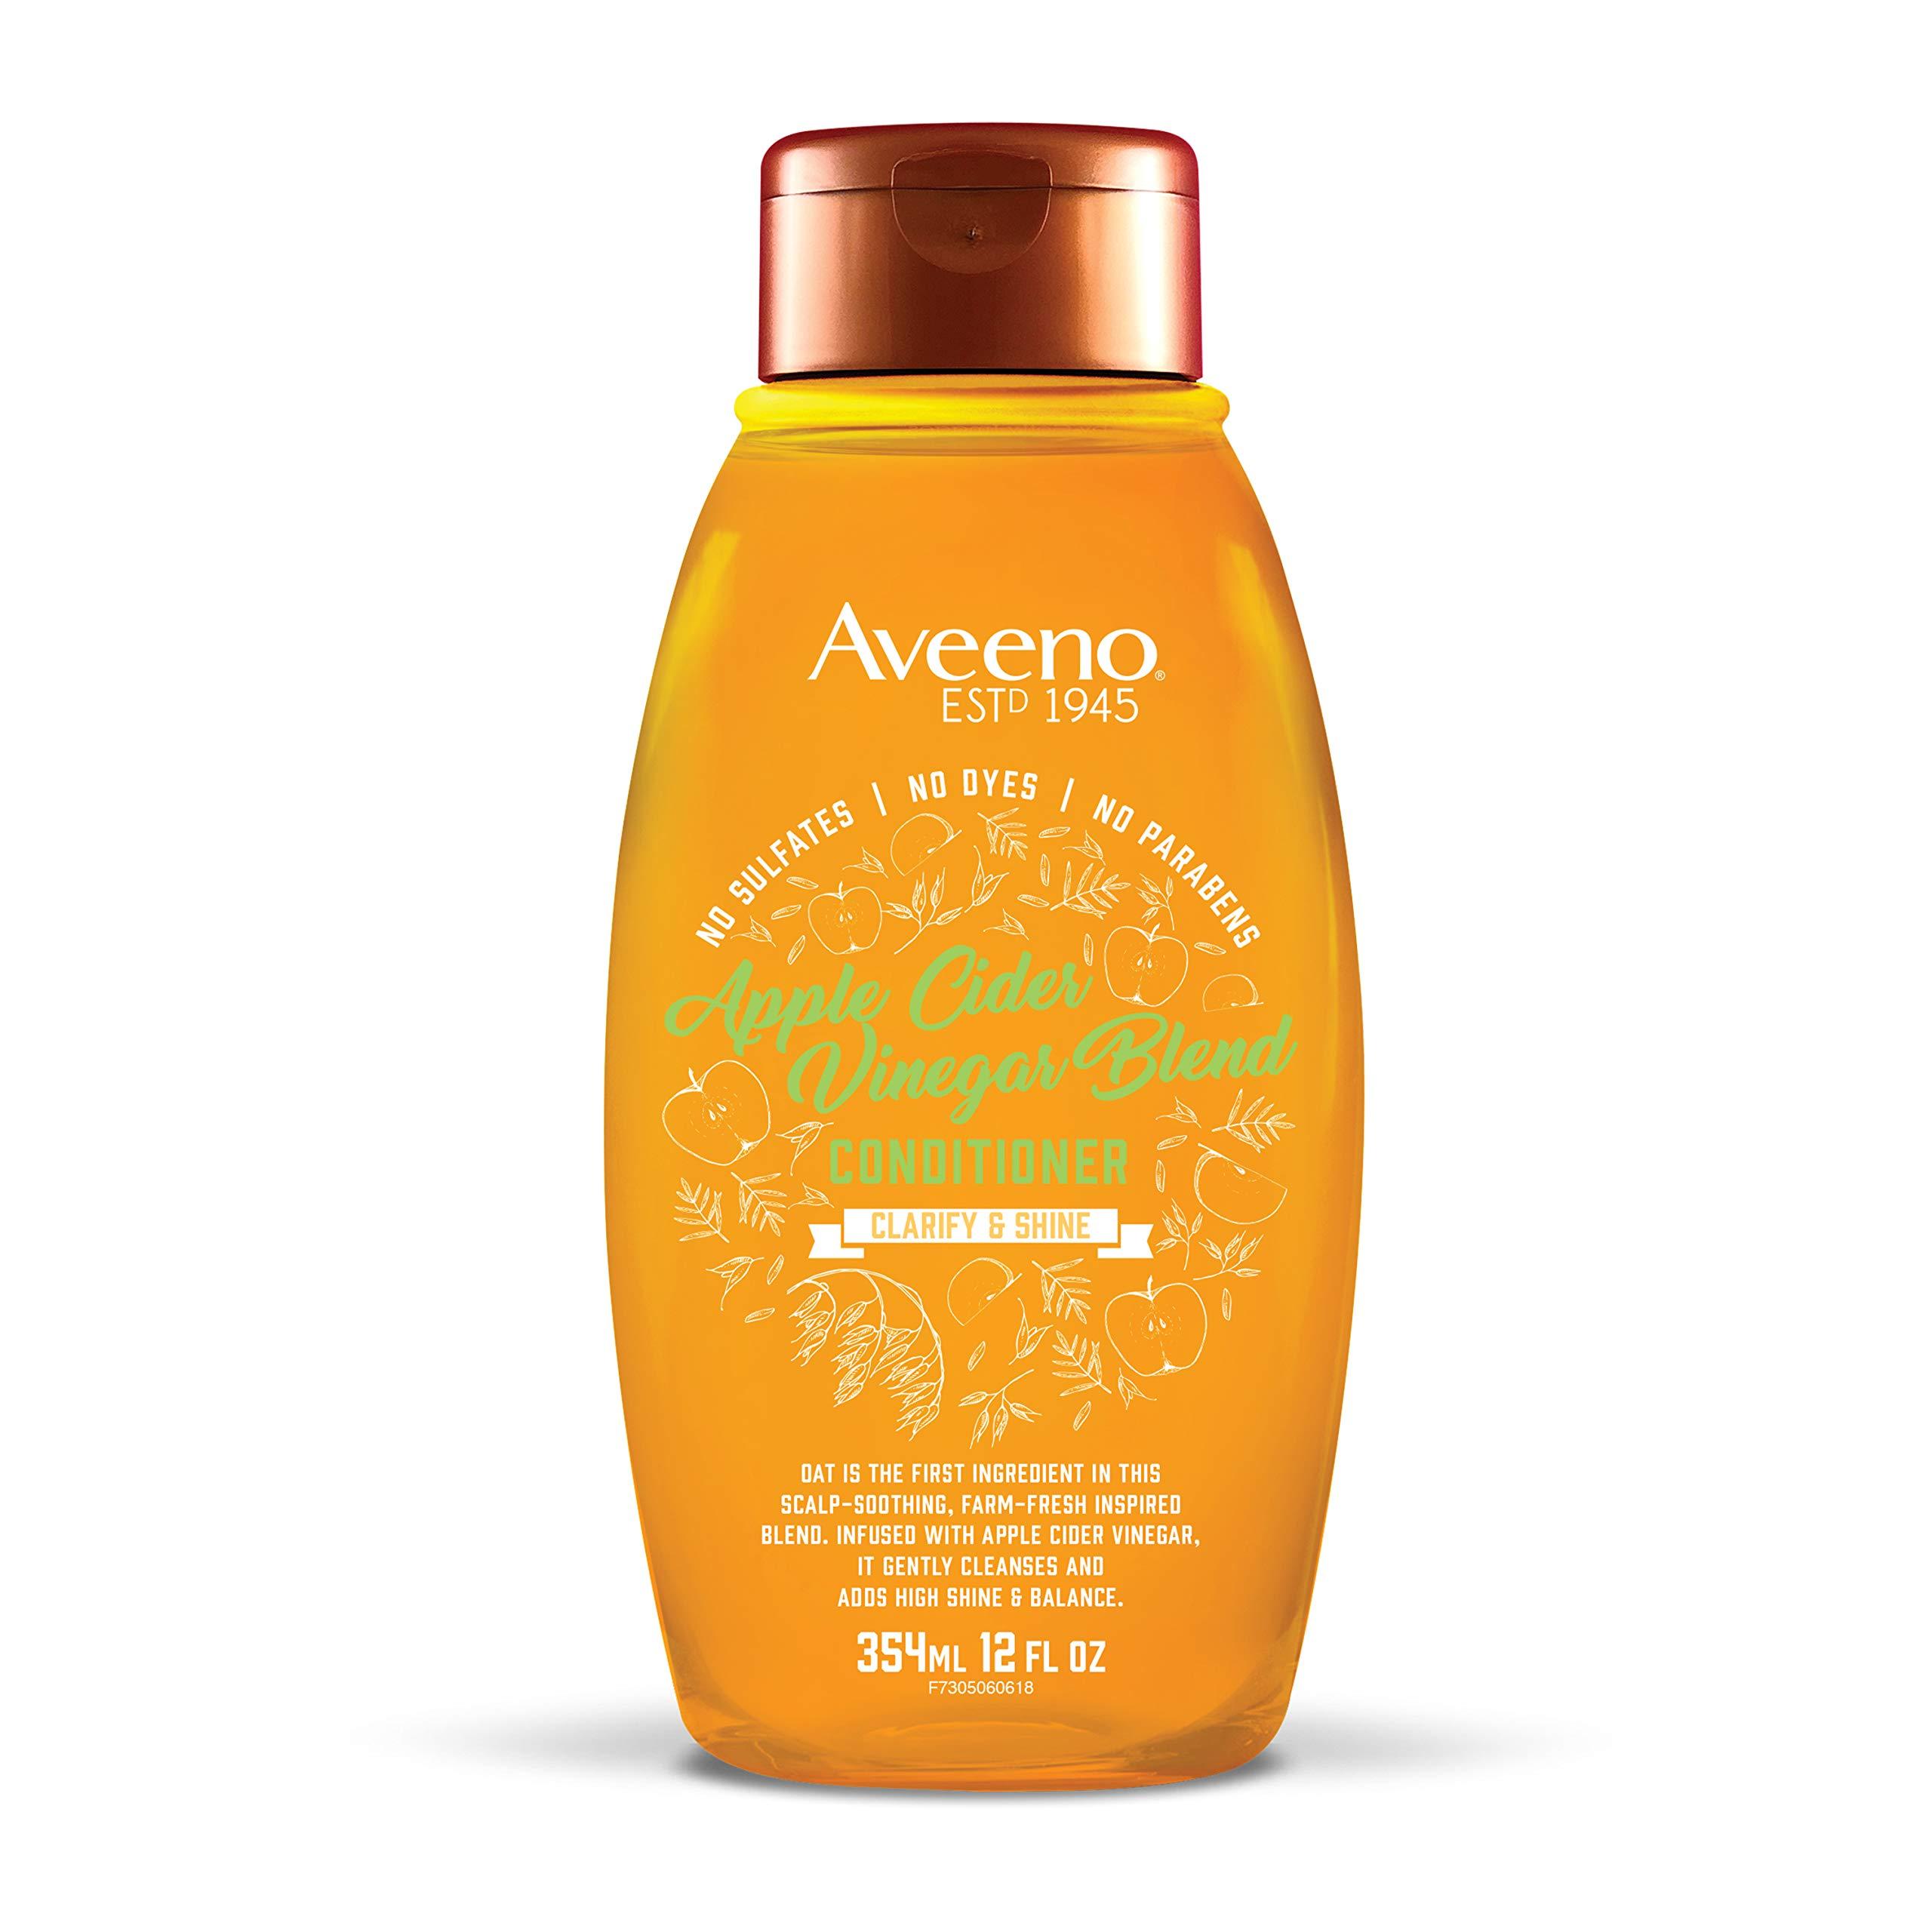 Aveeno Scalp Soothing Apple Cider Vinegar Blend Conditioner 67305, Fresh, 12 Fl Oz